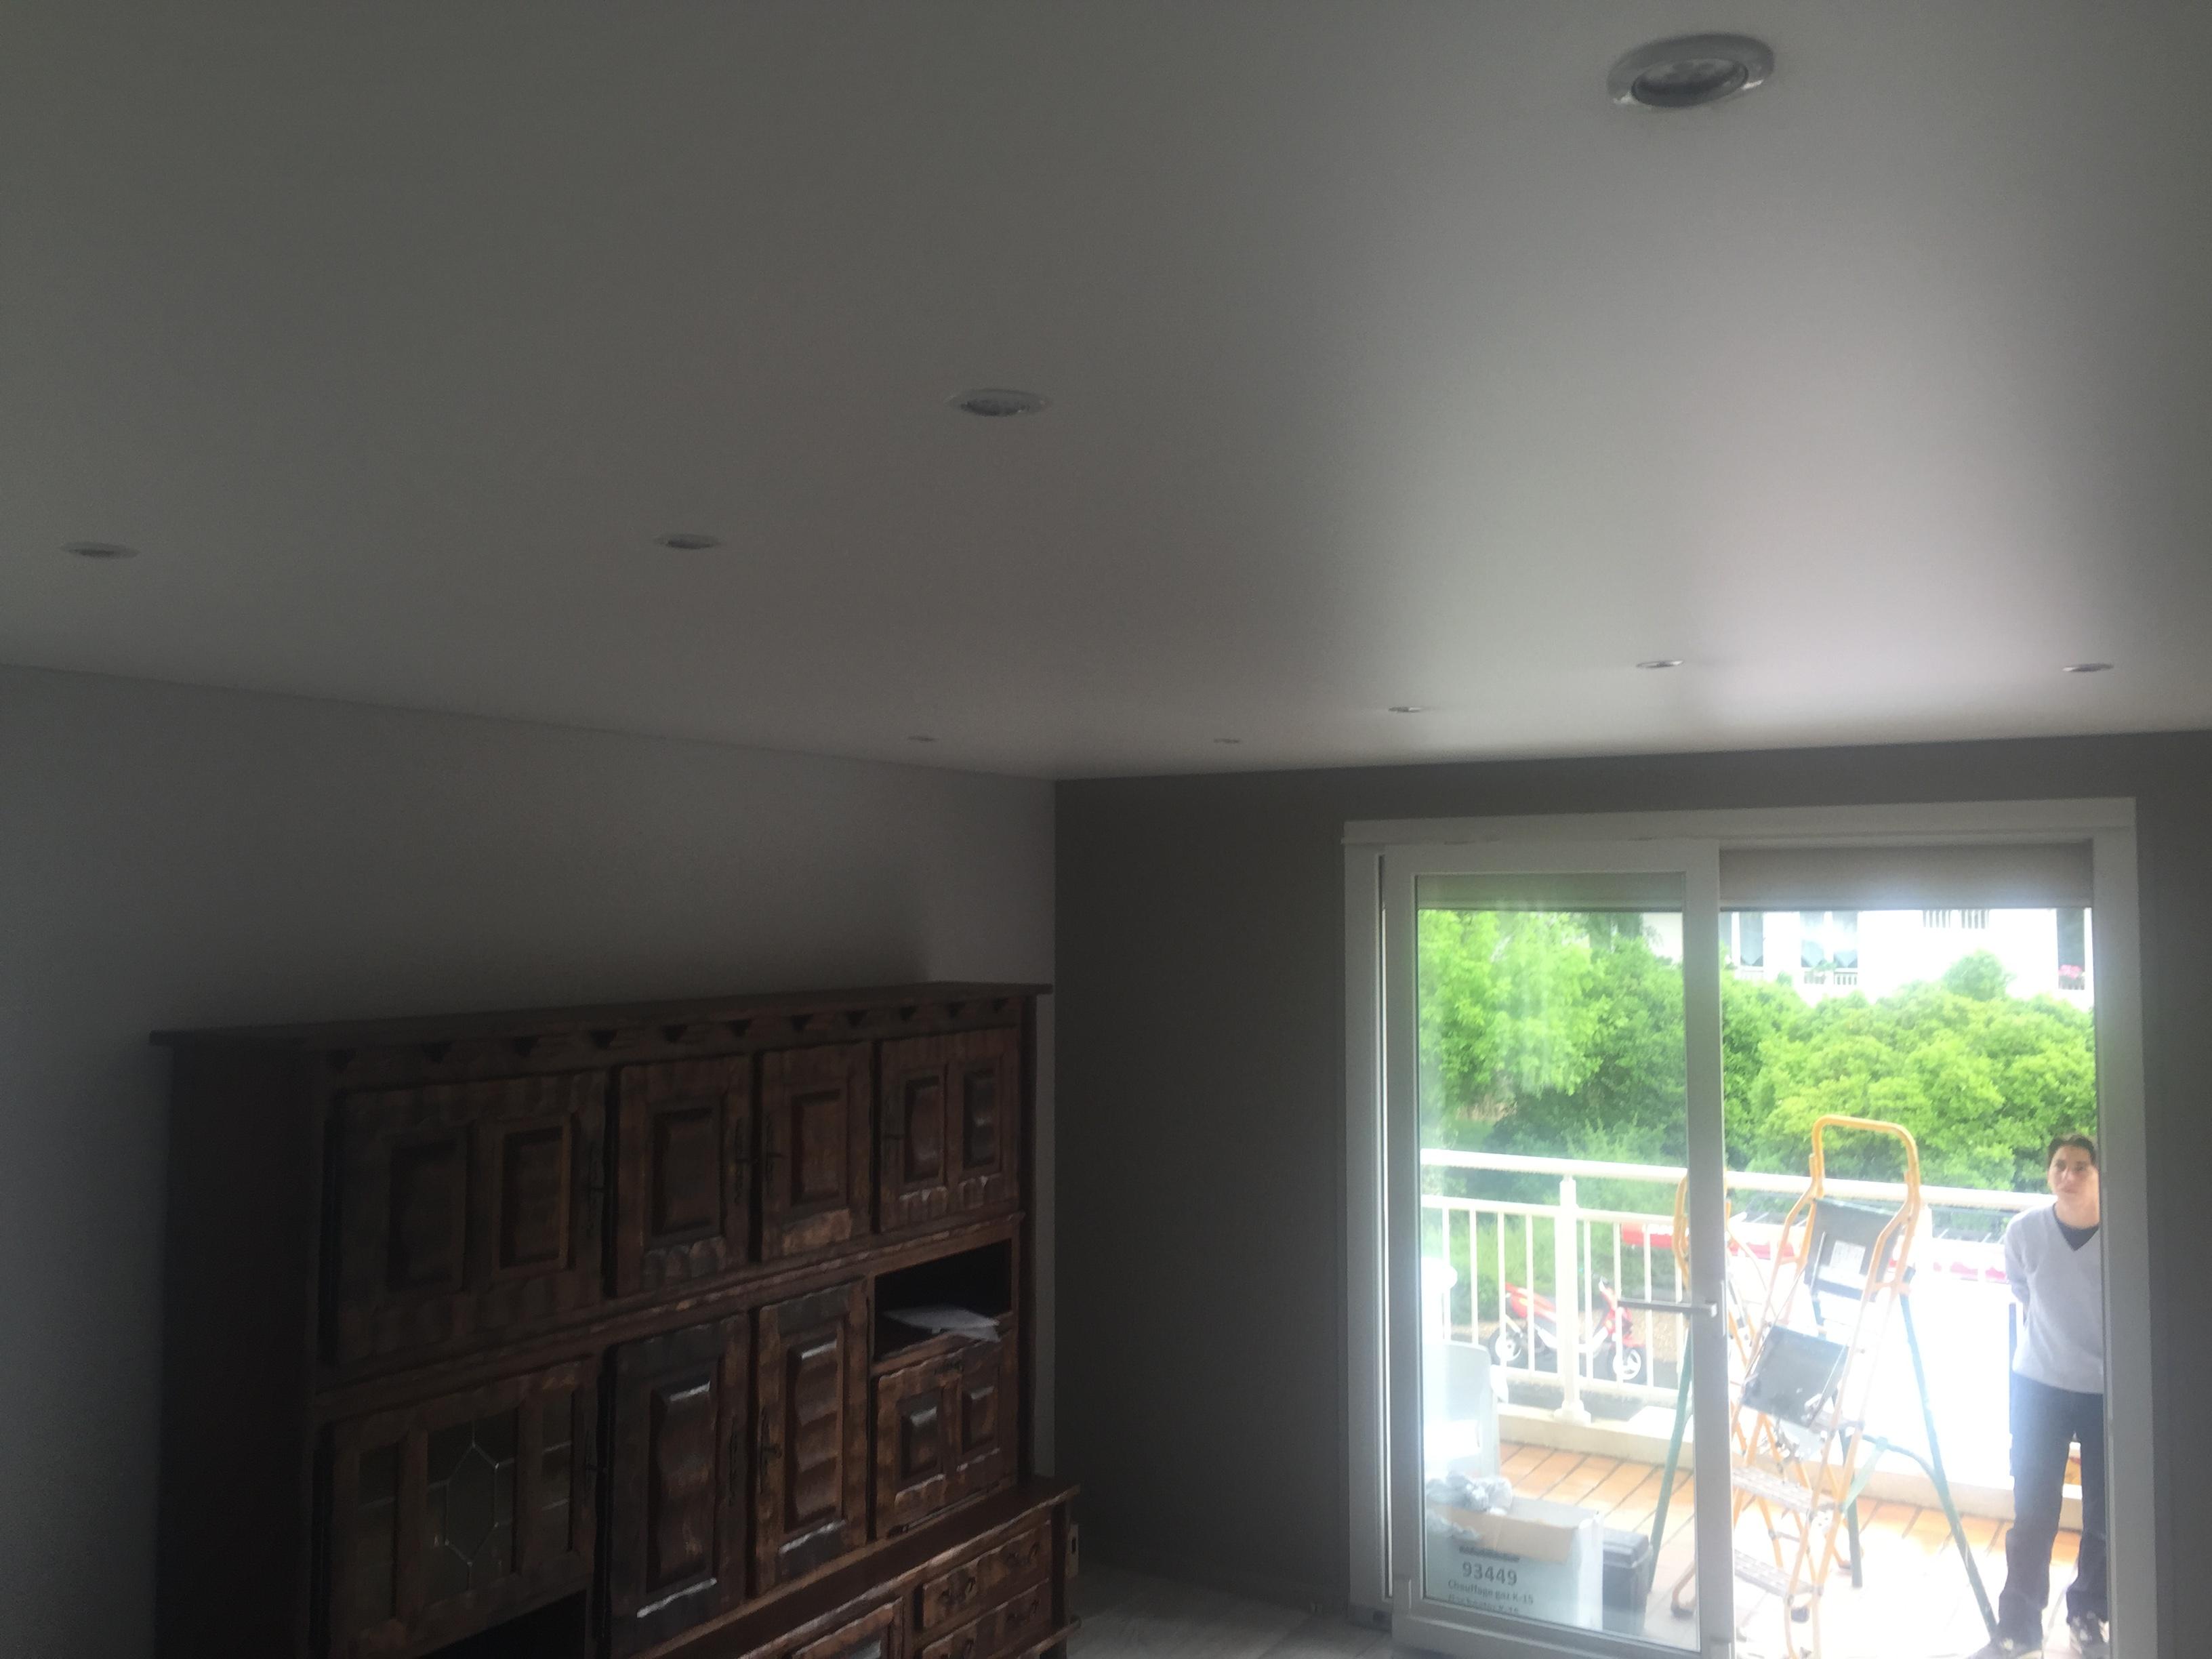 Plafond Tendu Avec Spots Plafond Tendu Avec Spots